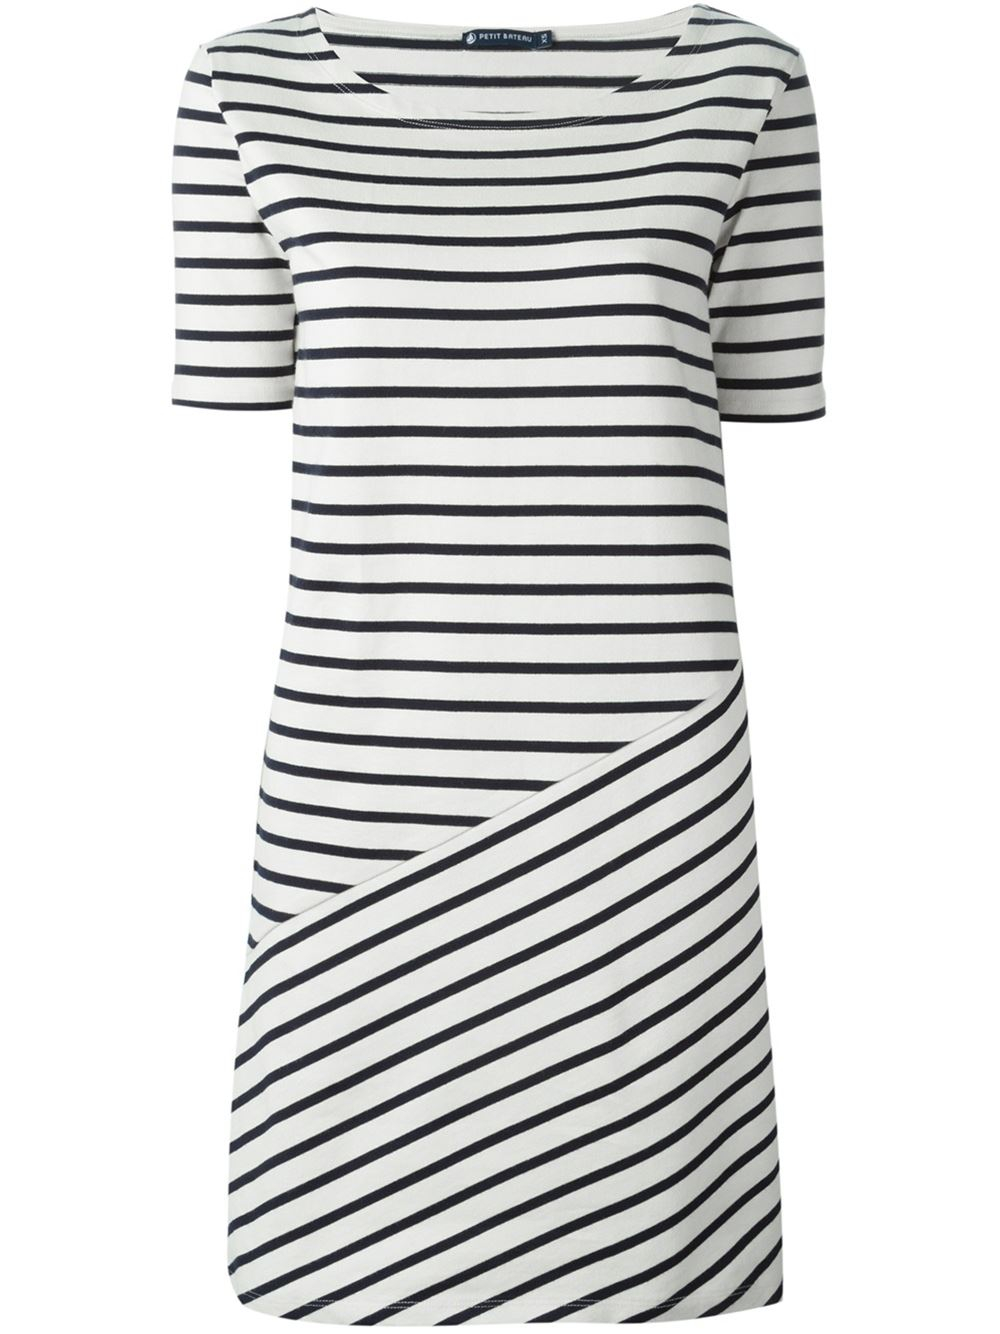 Petit bateau striped knit dress in black lyst for Petit bateau striped shirt